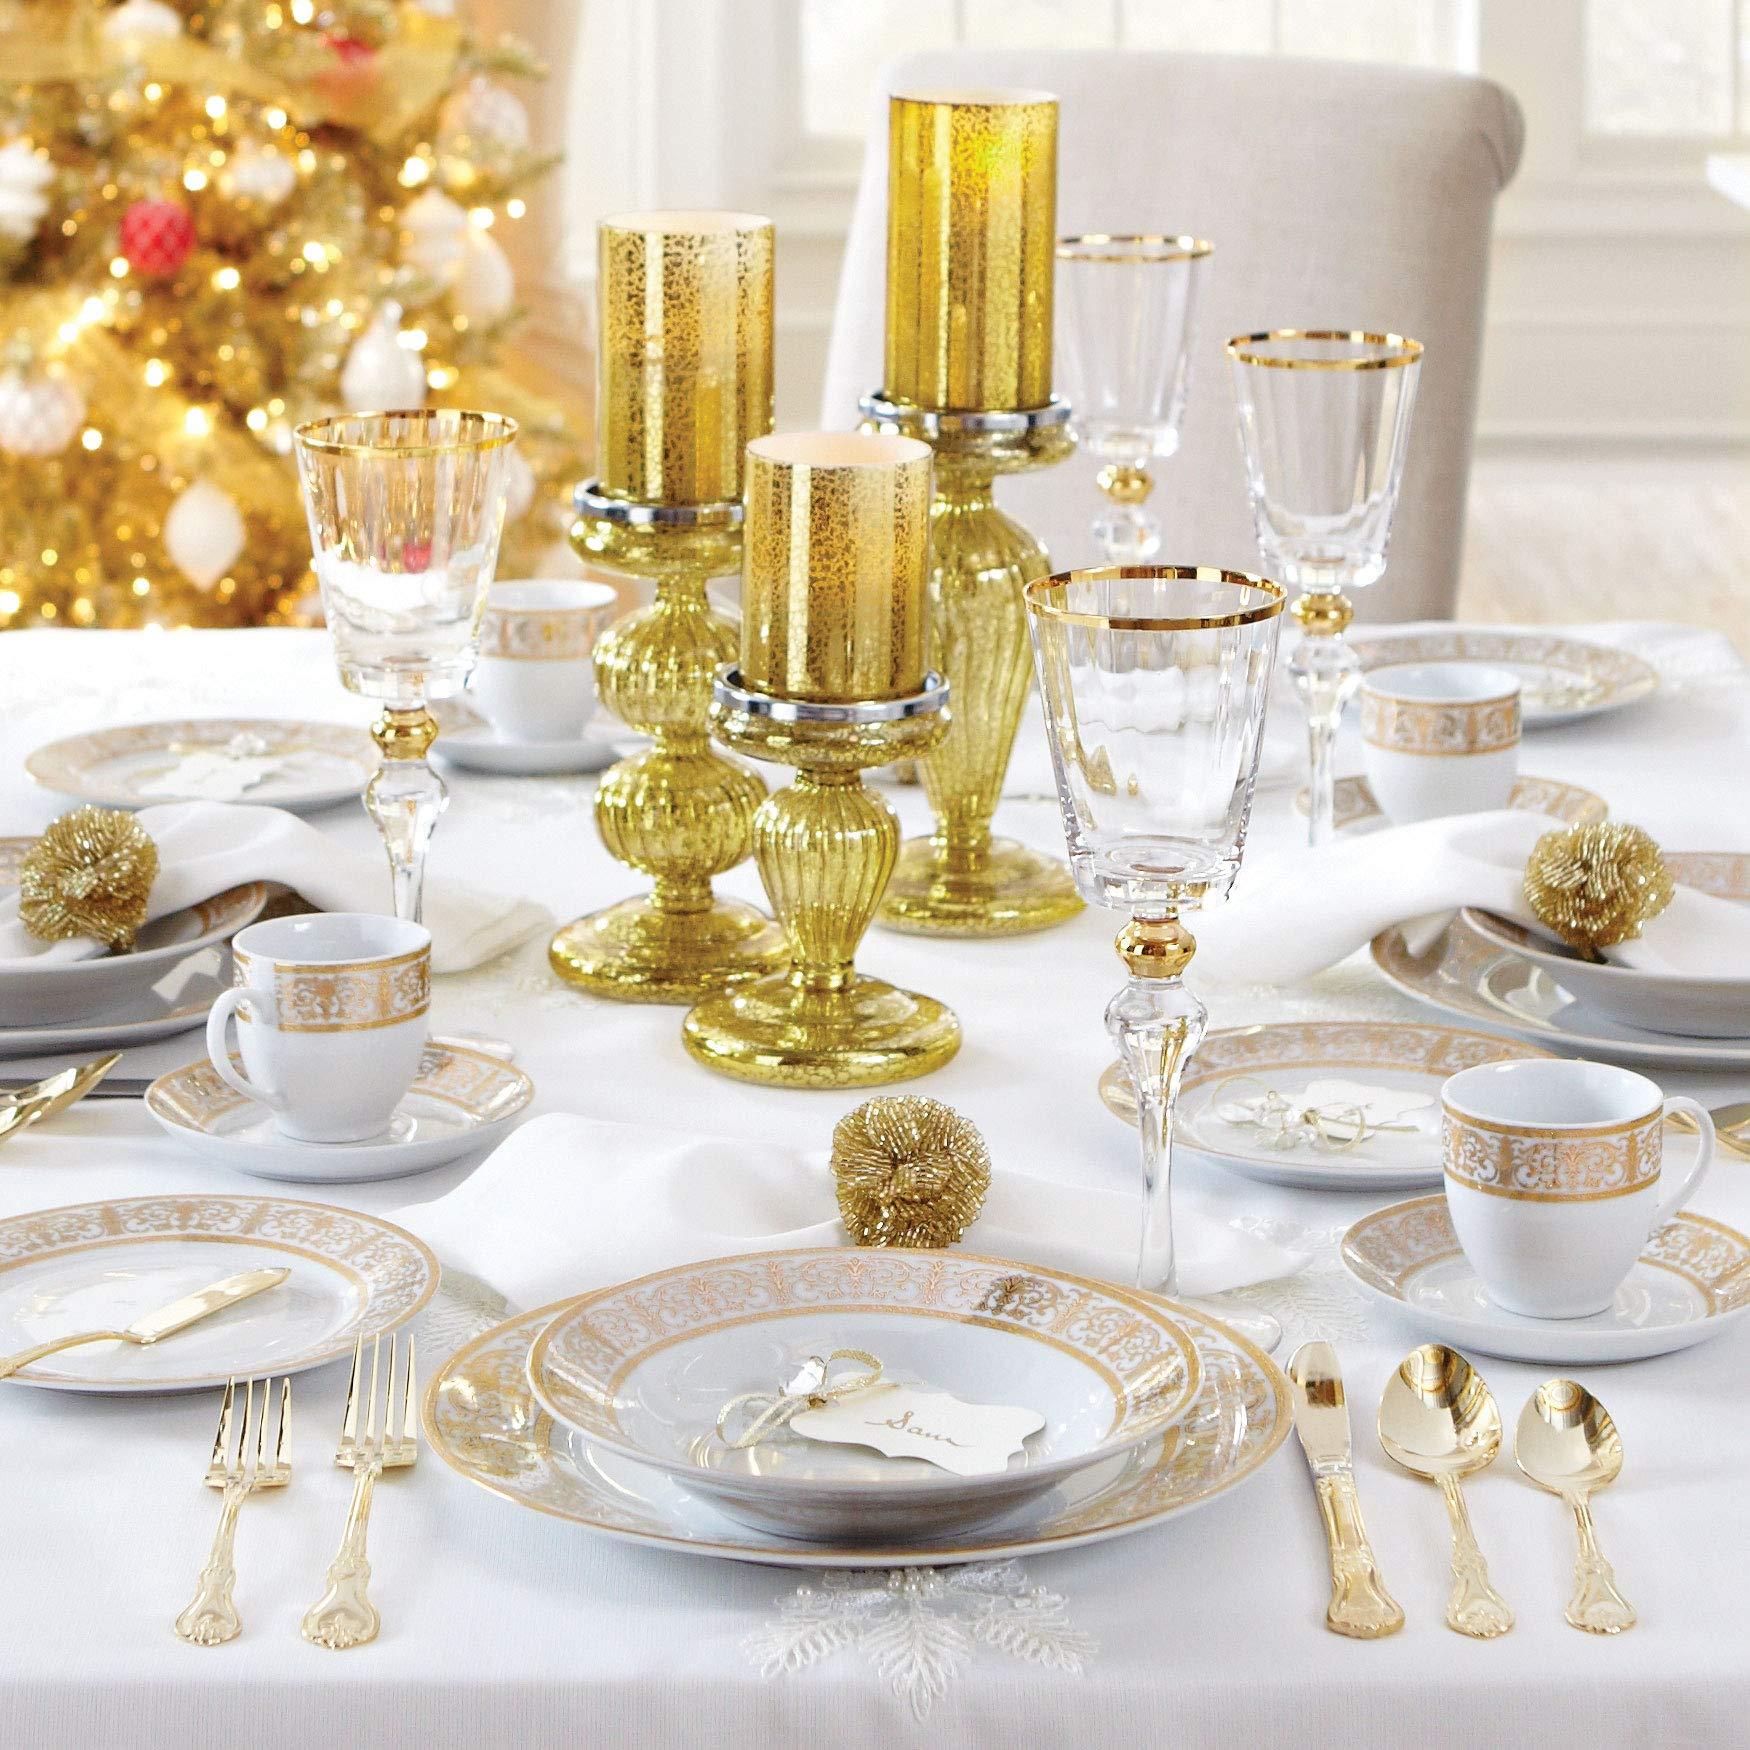 Brylanehome 40-Pc. Golden Ceramic Dinnerware Set (Gold White) - Gold White by BrylaneHome